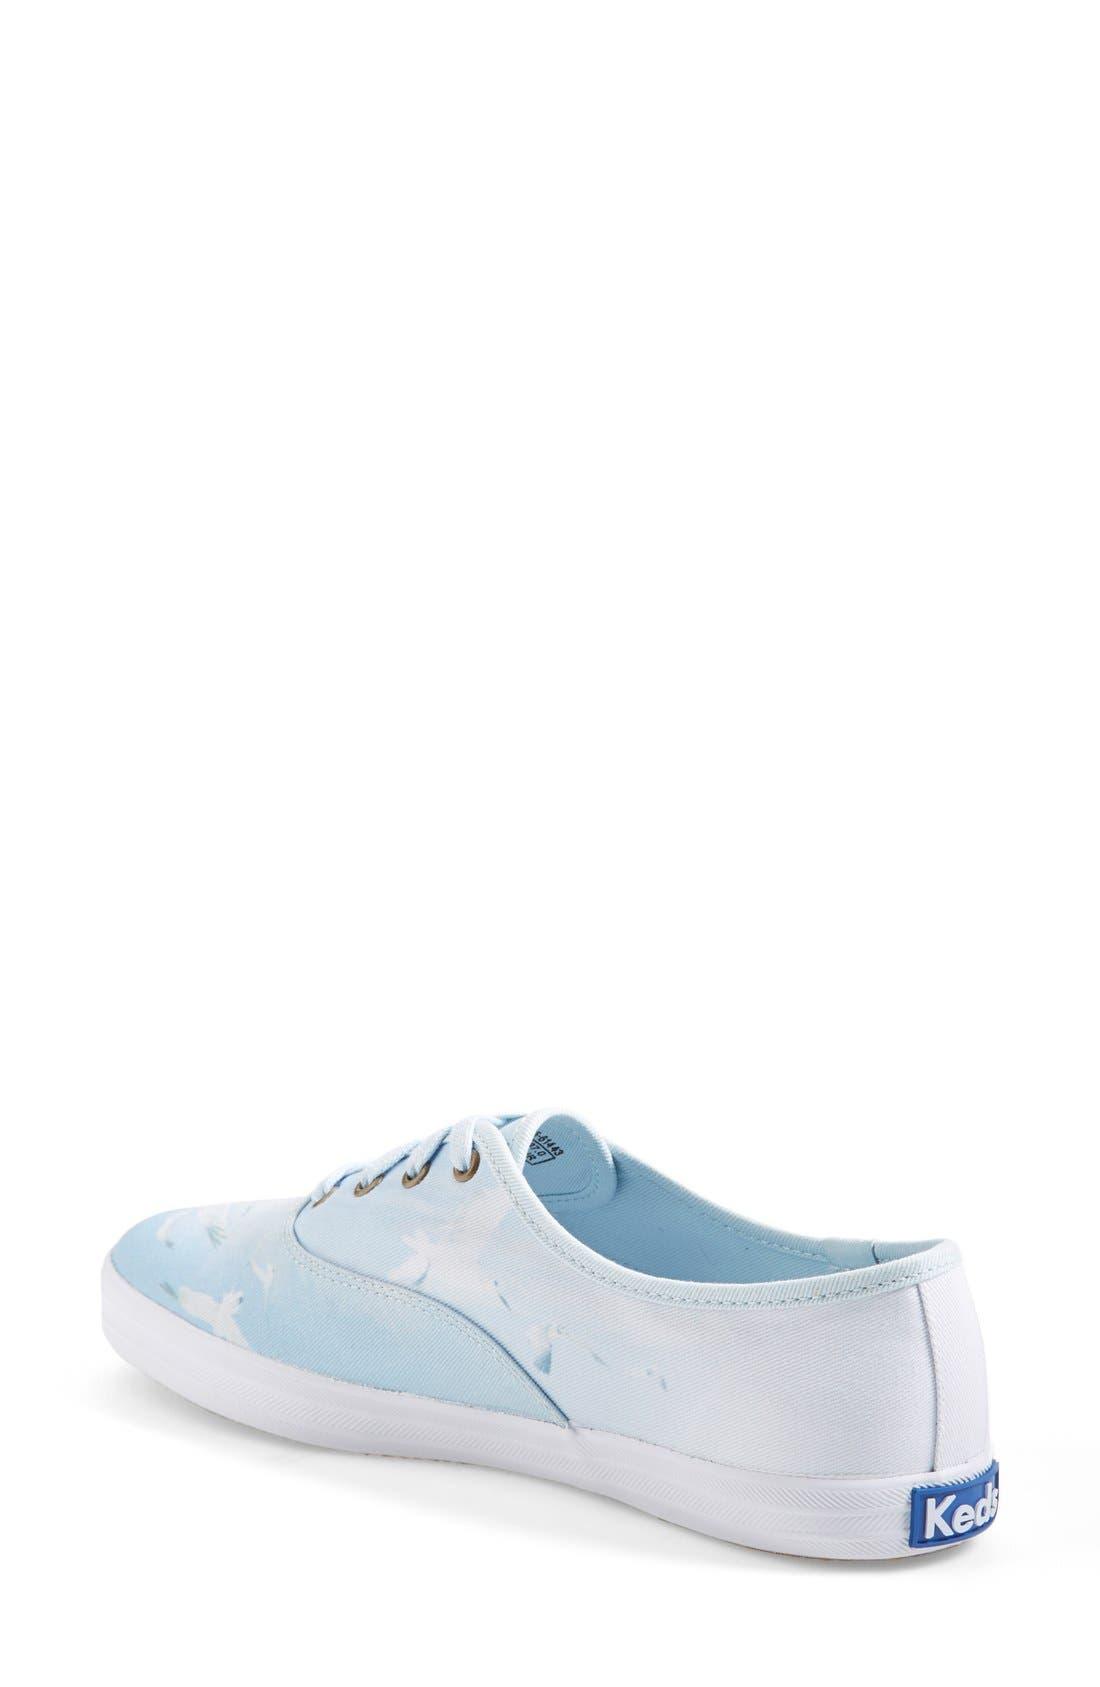 Alternate Image 2  - Keds® Taylor Swift 'Champion -1989' Sneaker (Women)